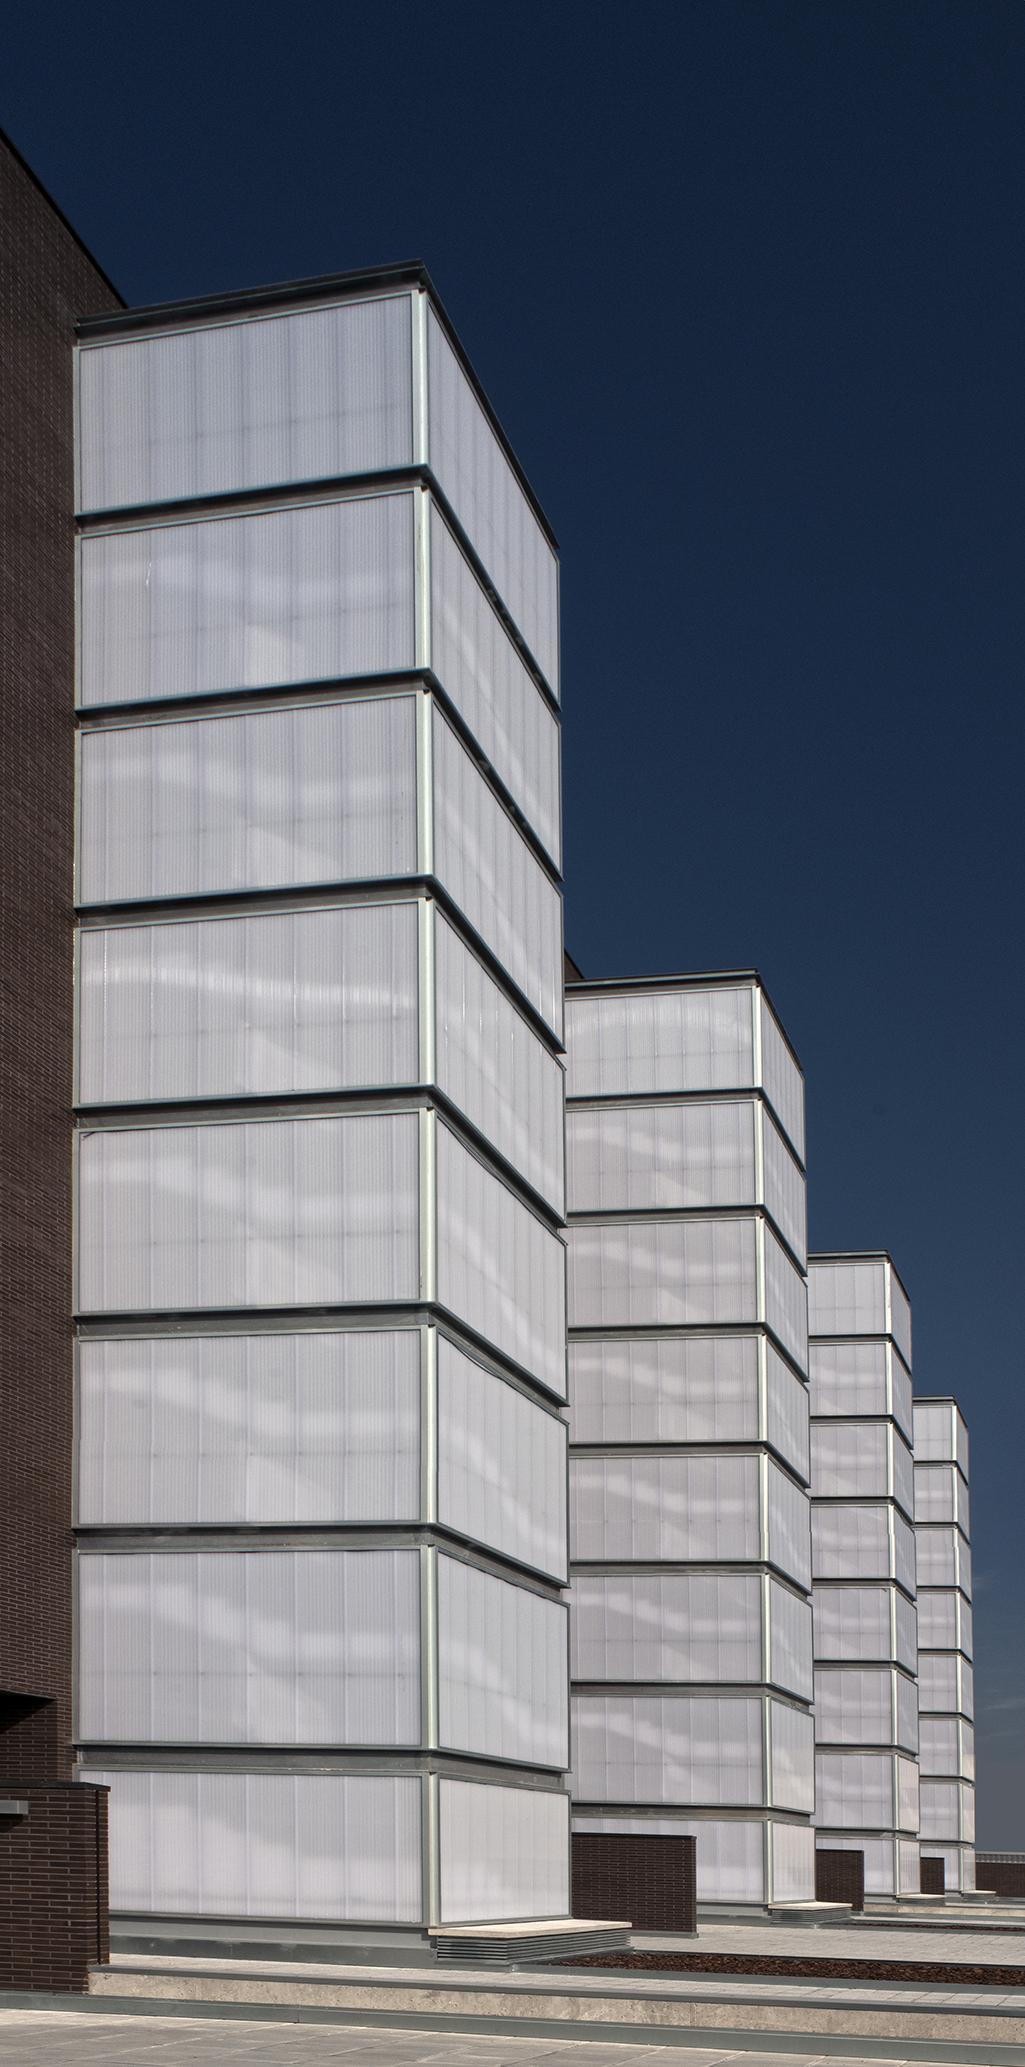 Arquitectura de calidad